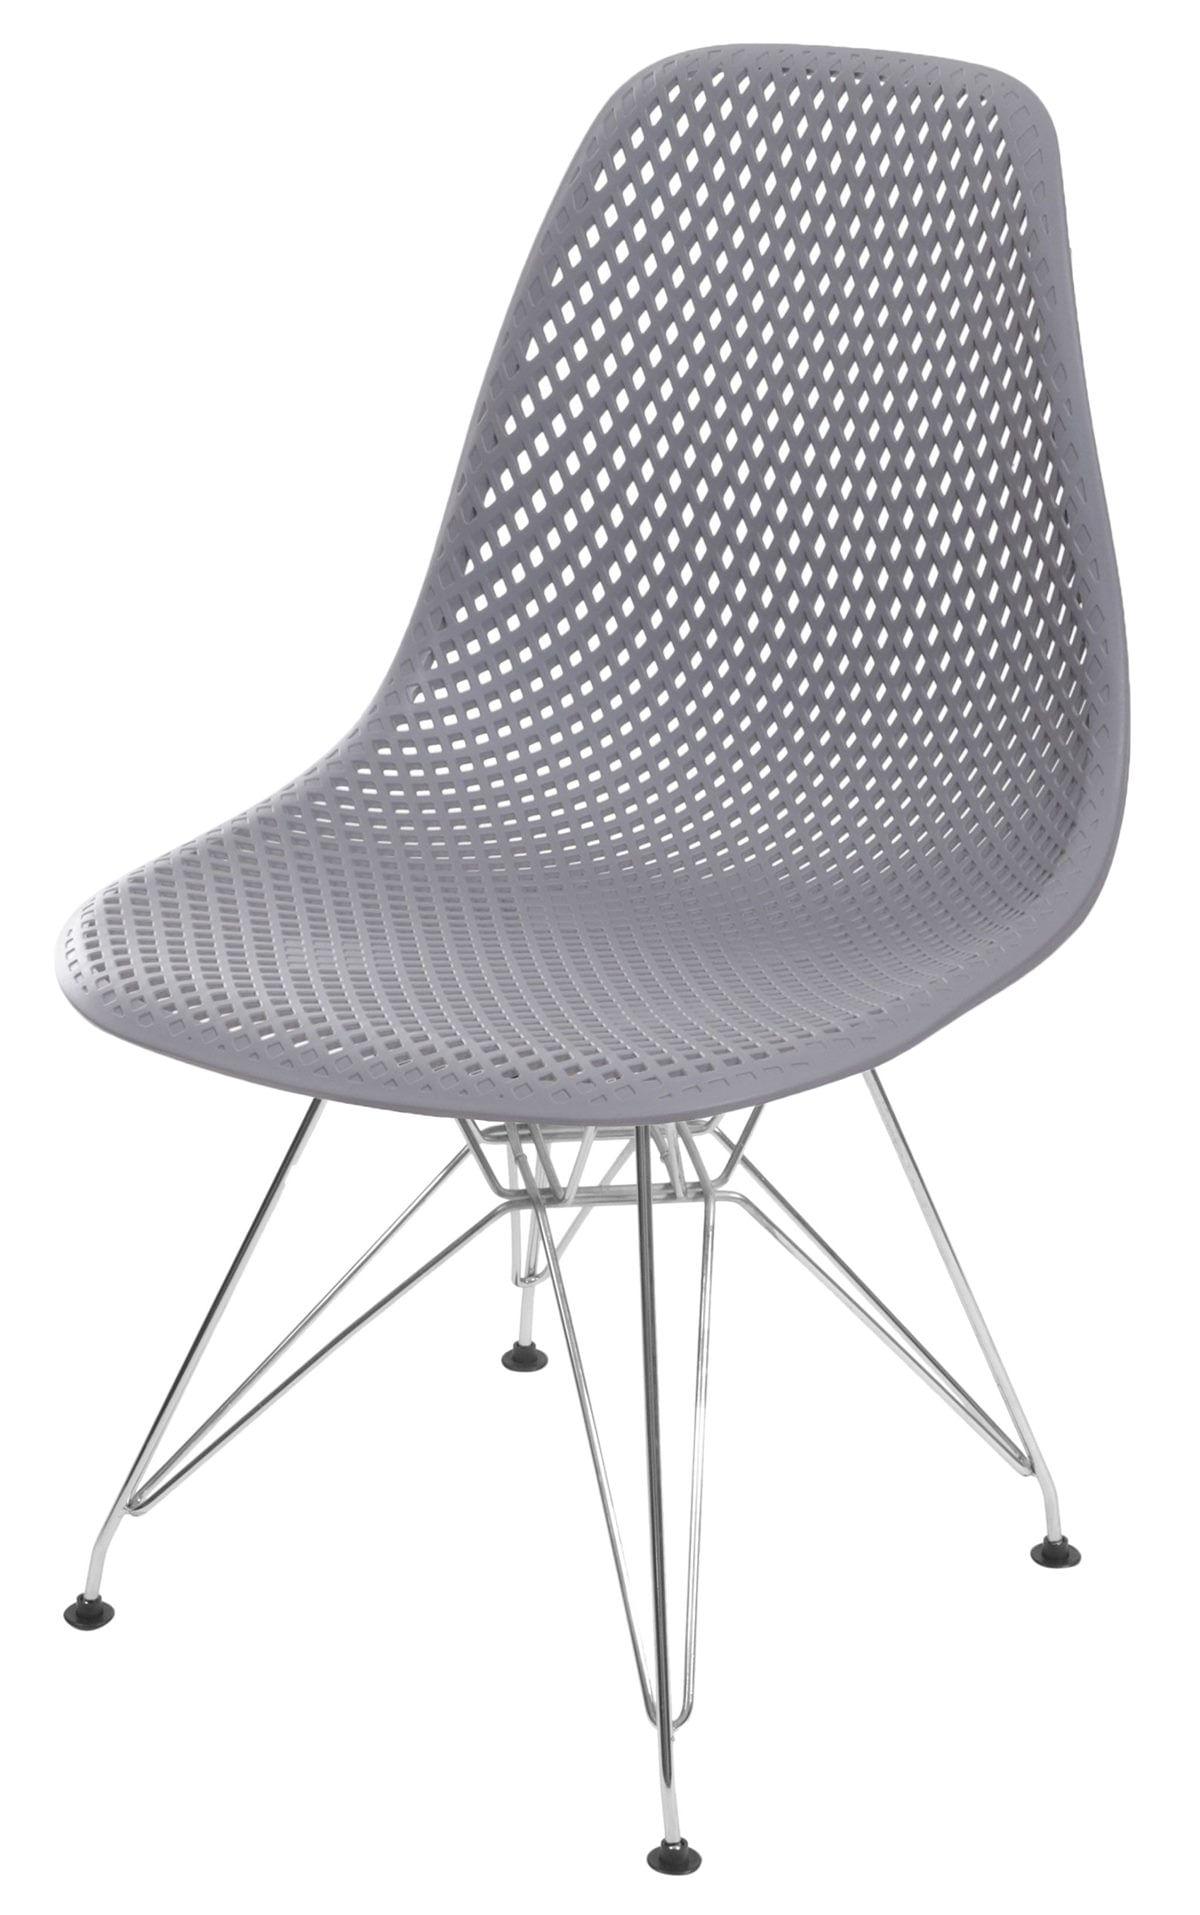 Cadeira Eames Furadinha cor Cinza com Base Cromada - 55989